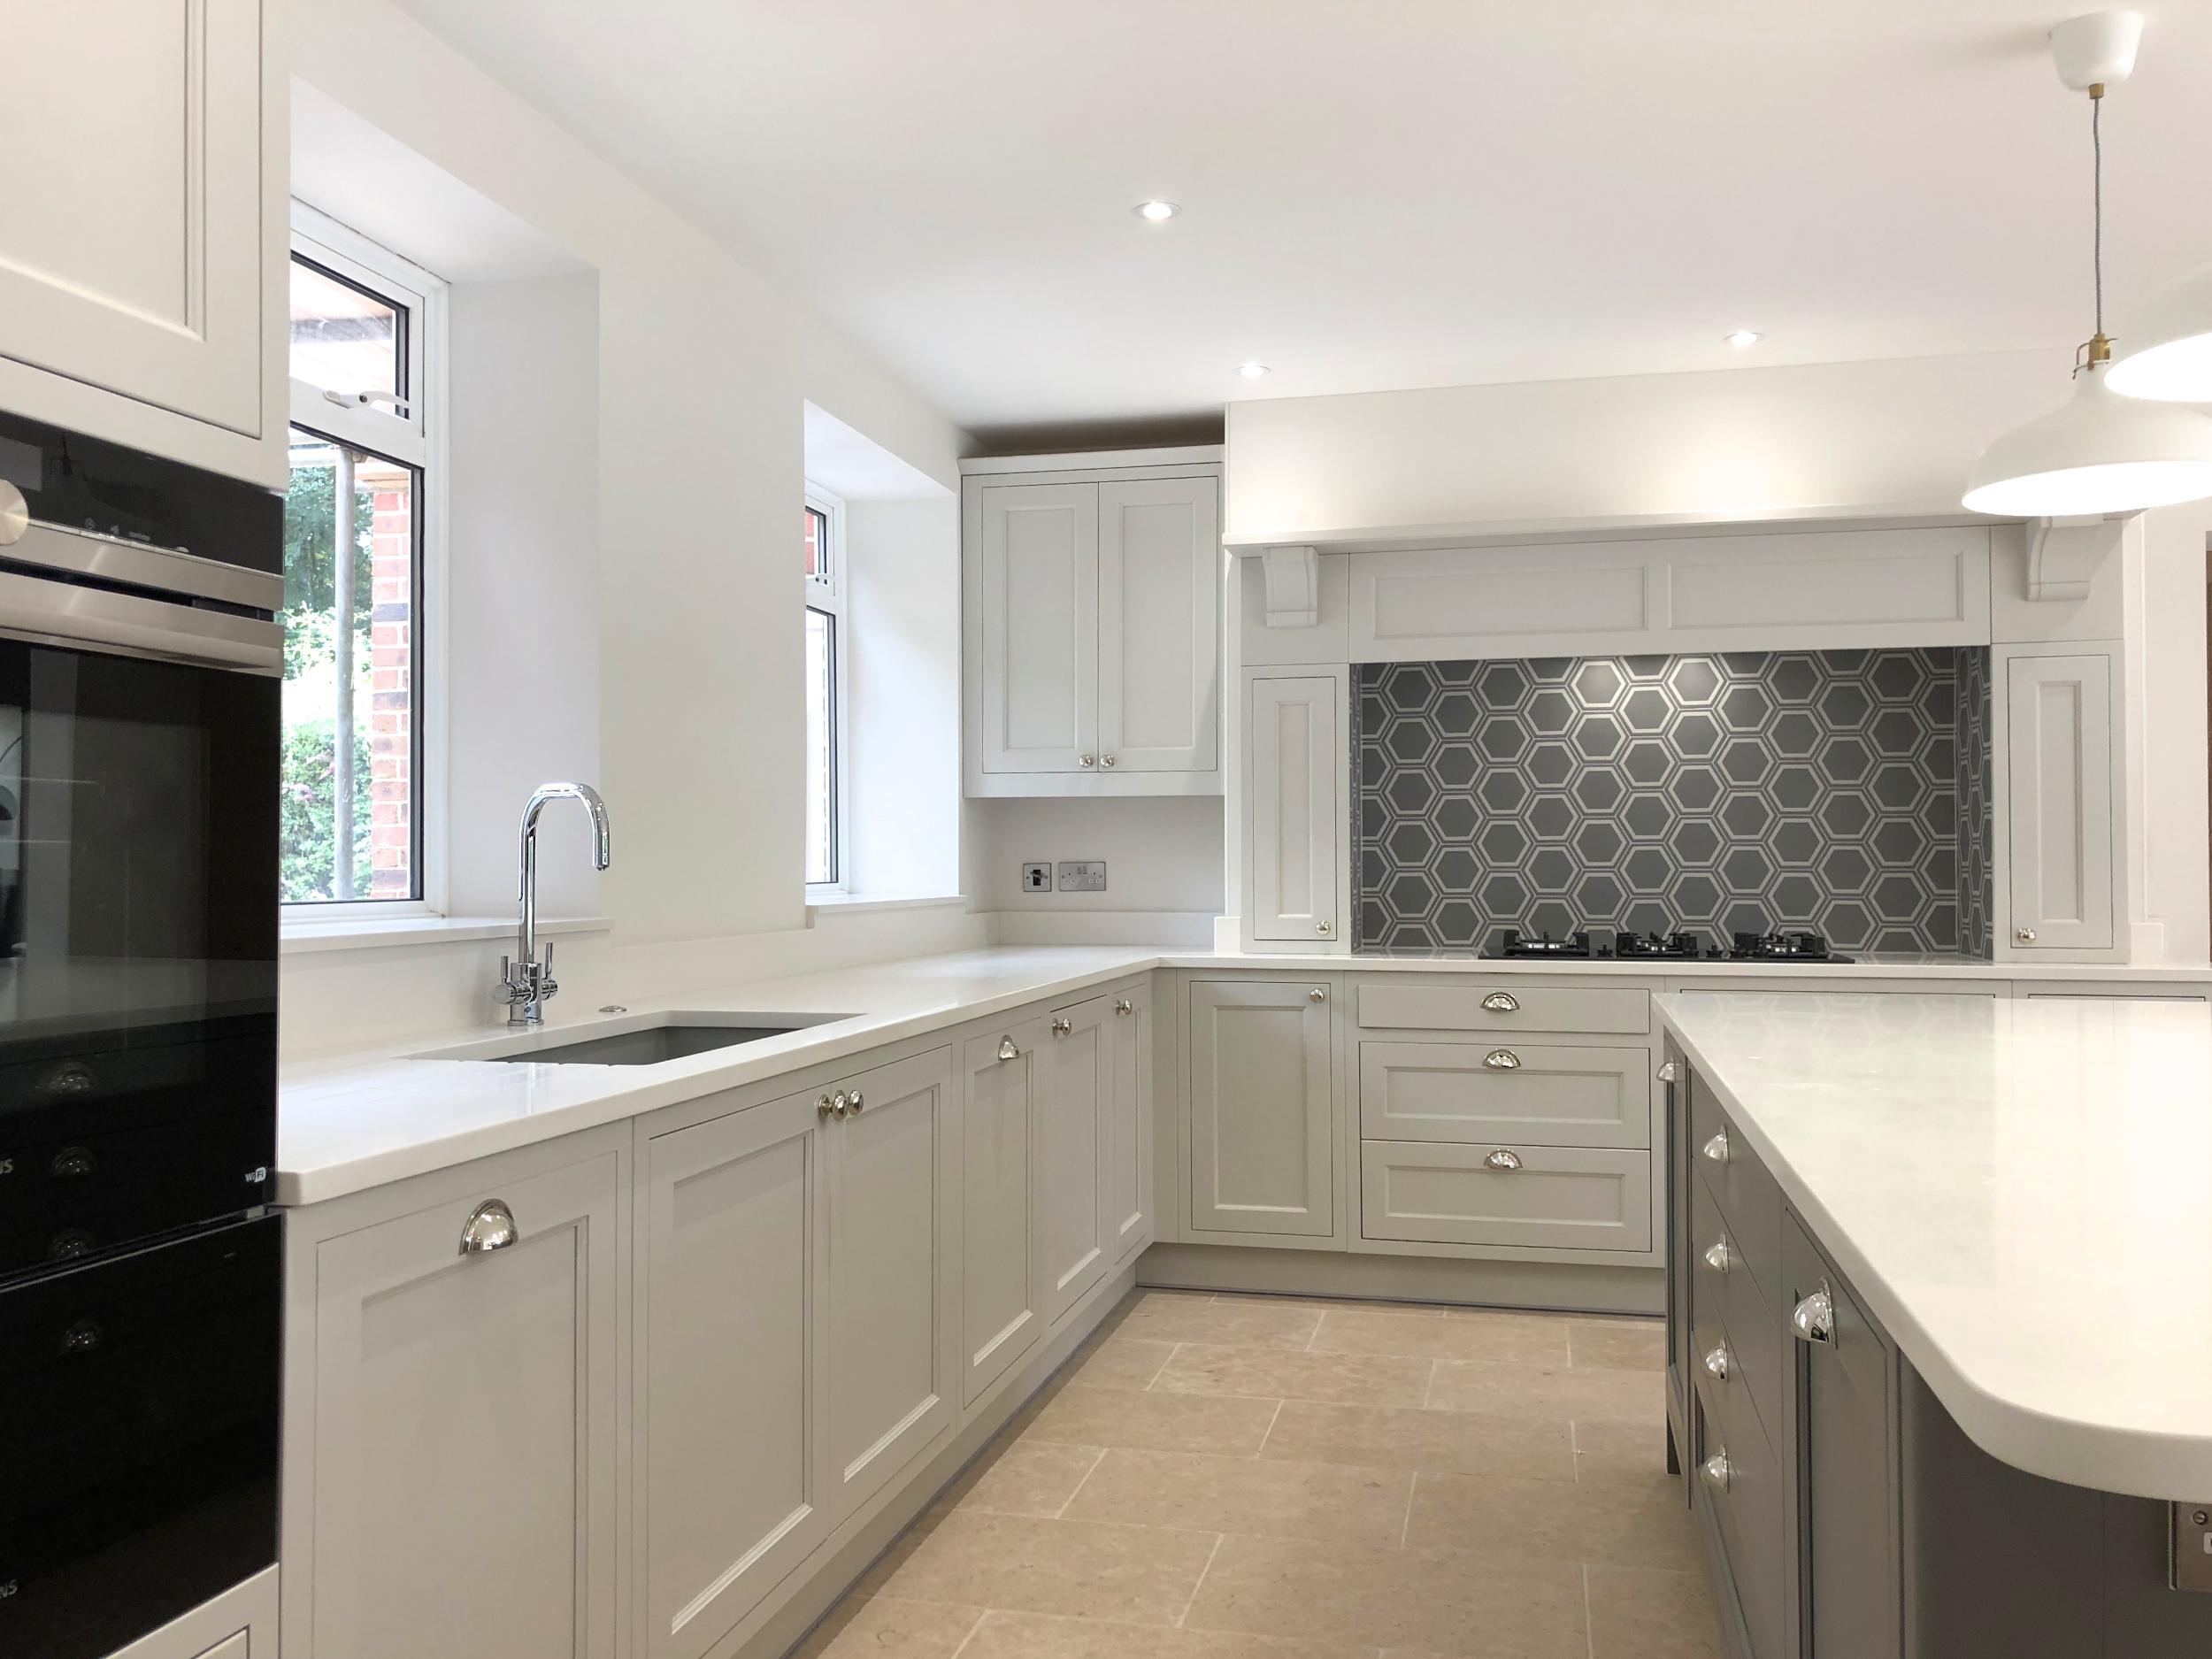 White Grey Shaker Wood Kitchen Oxfordshire 979.jpg